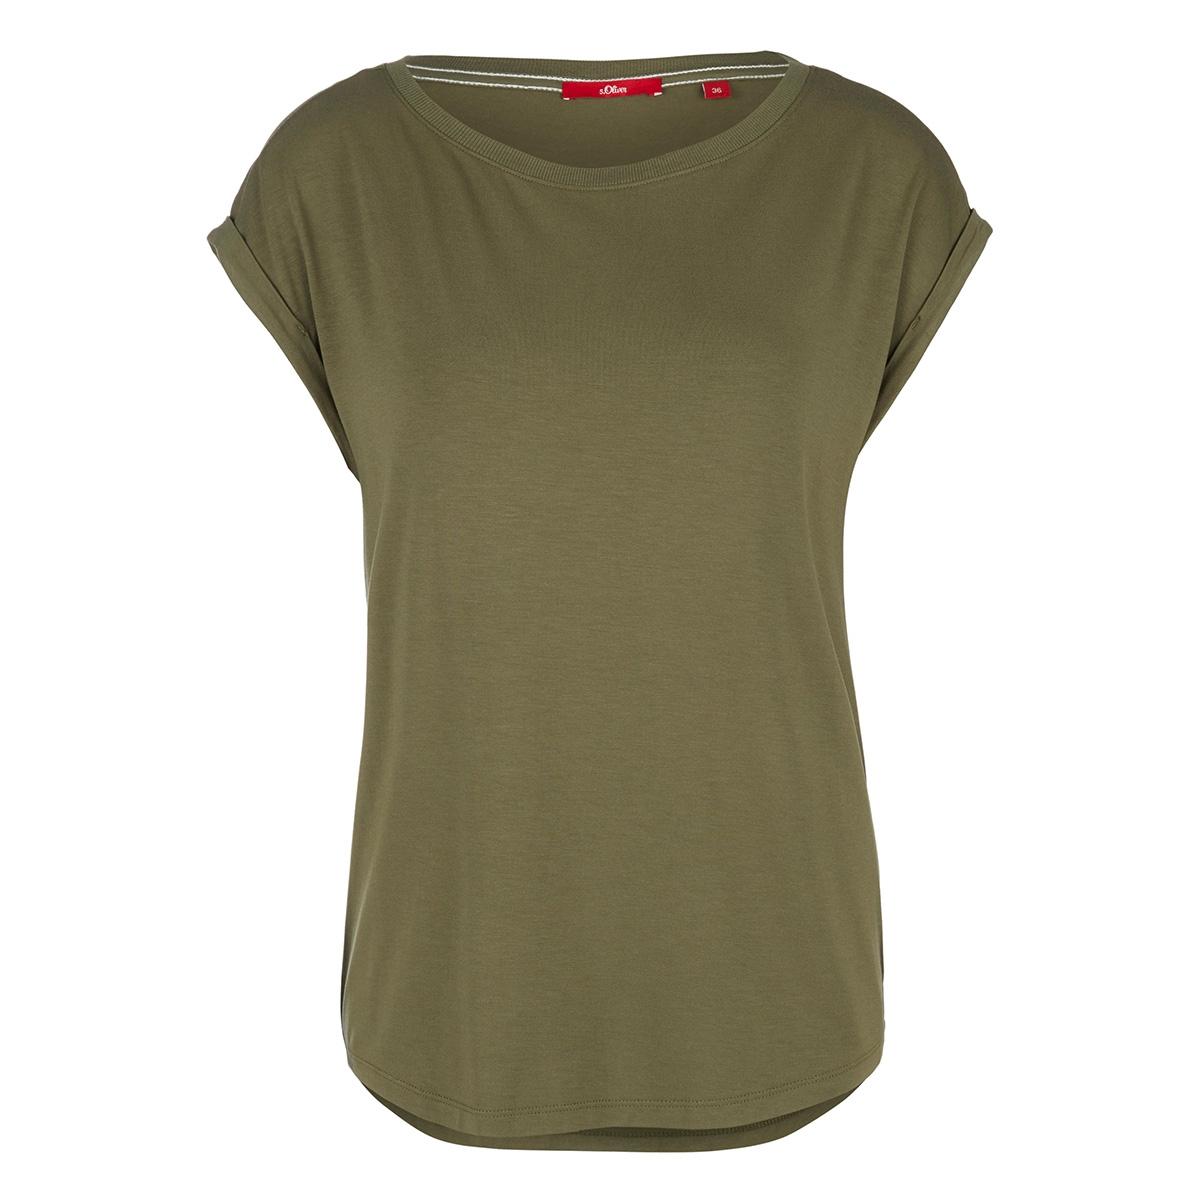 viscose shirt met geribde rand 14004325091 s.oliver t-shirt 7810